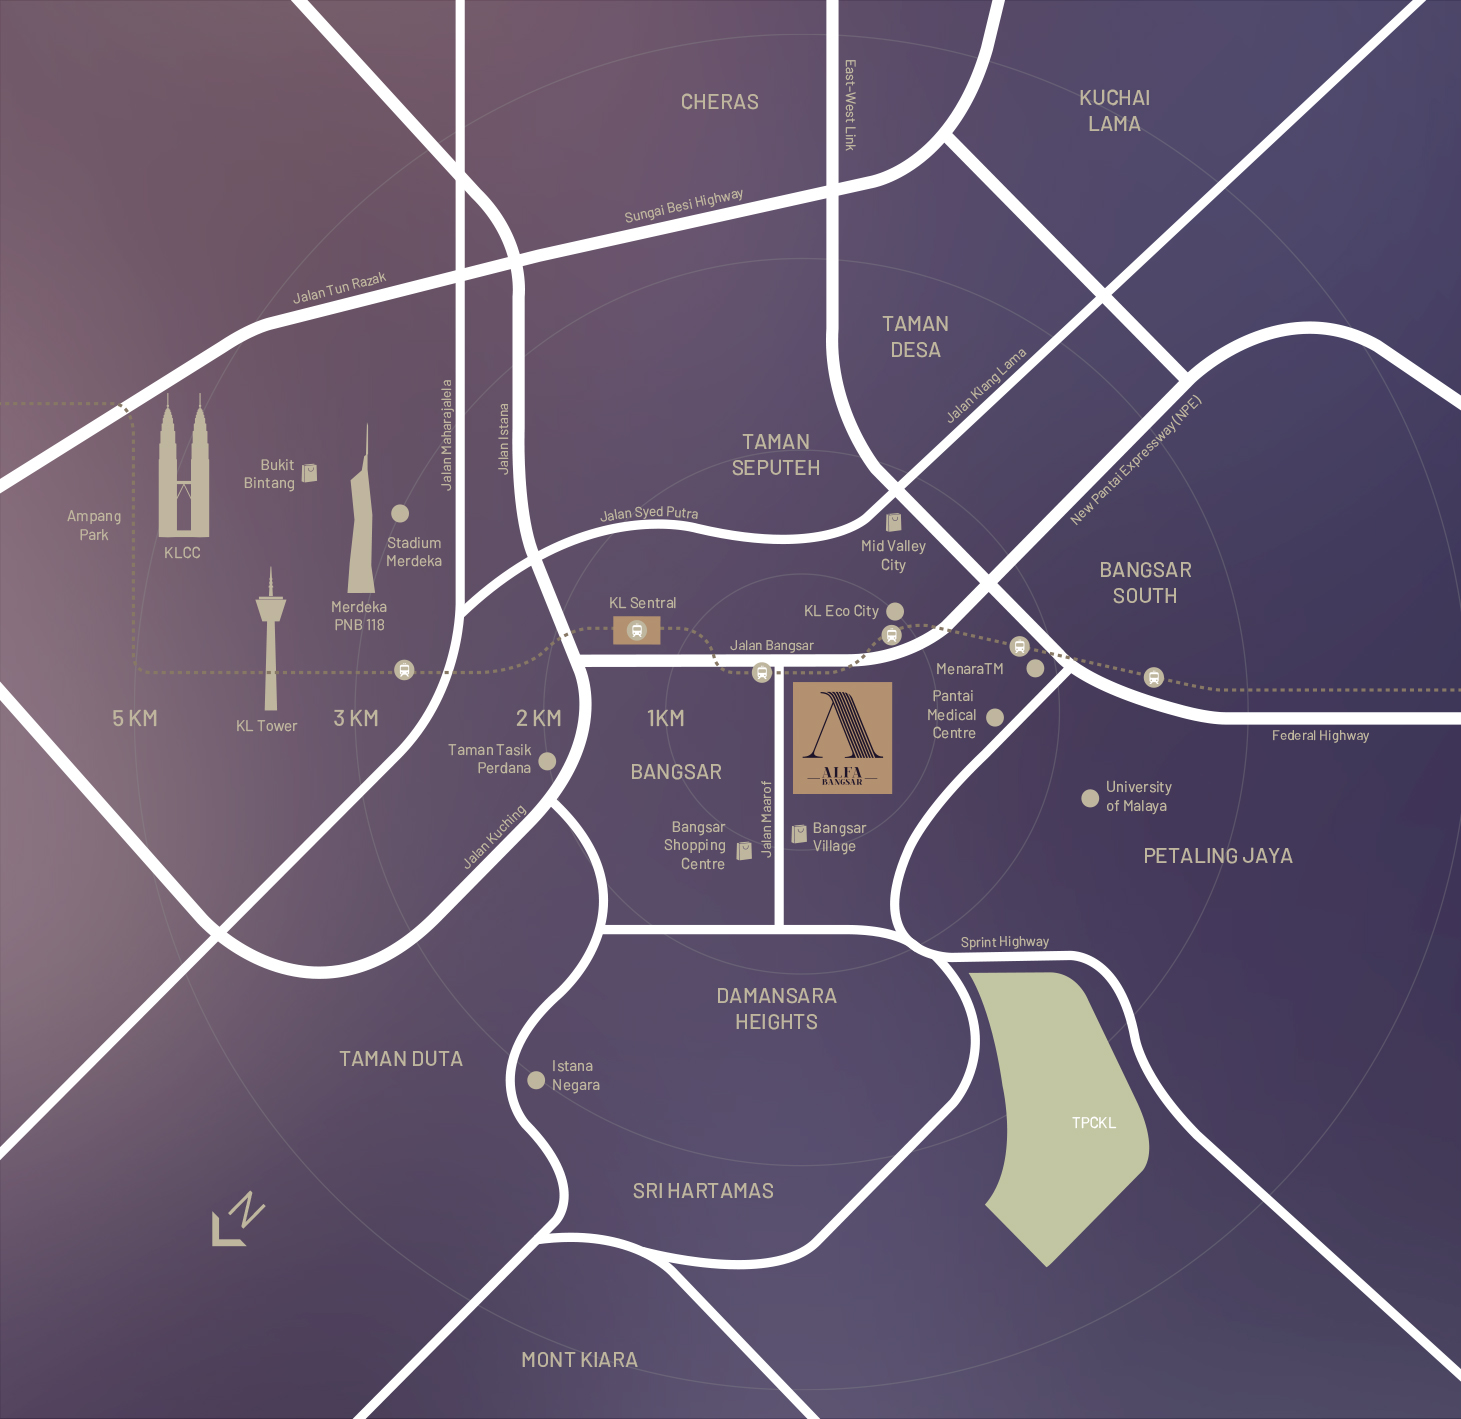 A map showing Alfa Bangsar condo or service apartment location nearby Bangsar Village, Bangsar Shopping Centre, Bangsar South, and KL Sentral